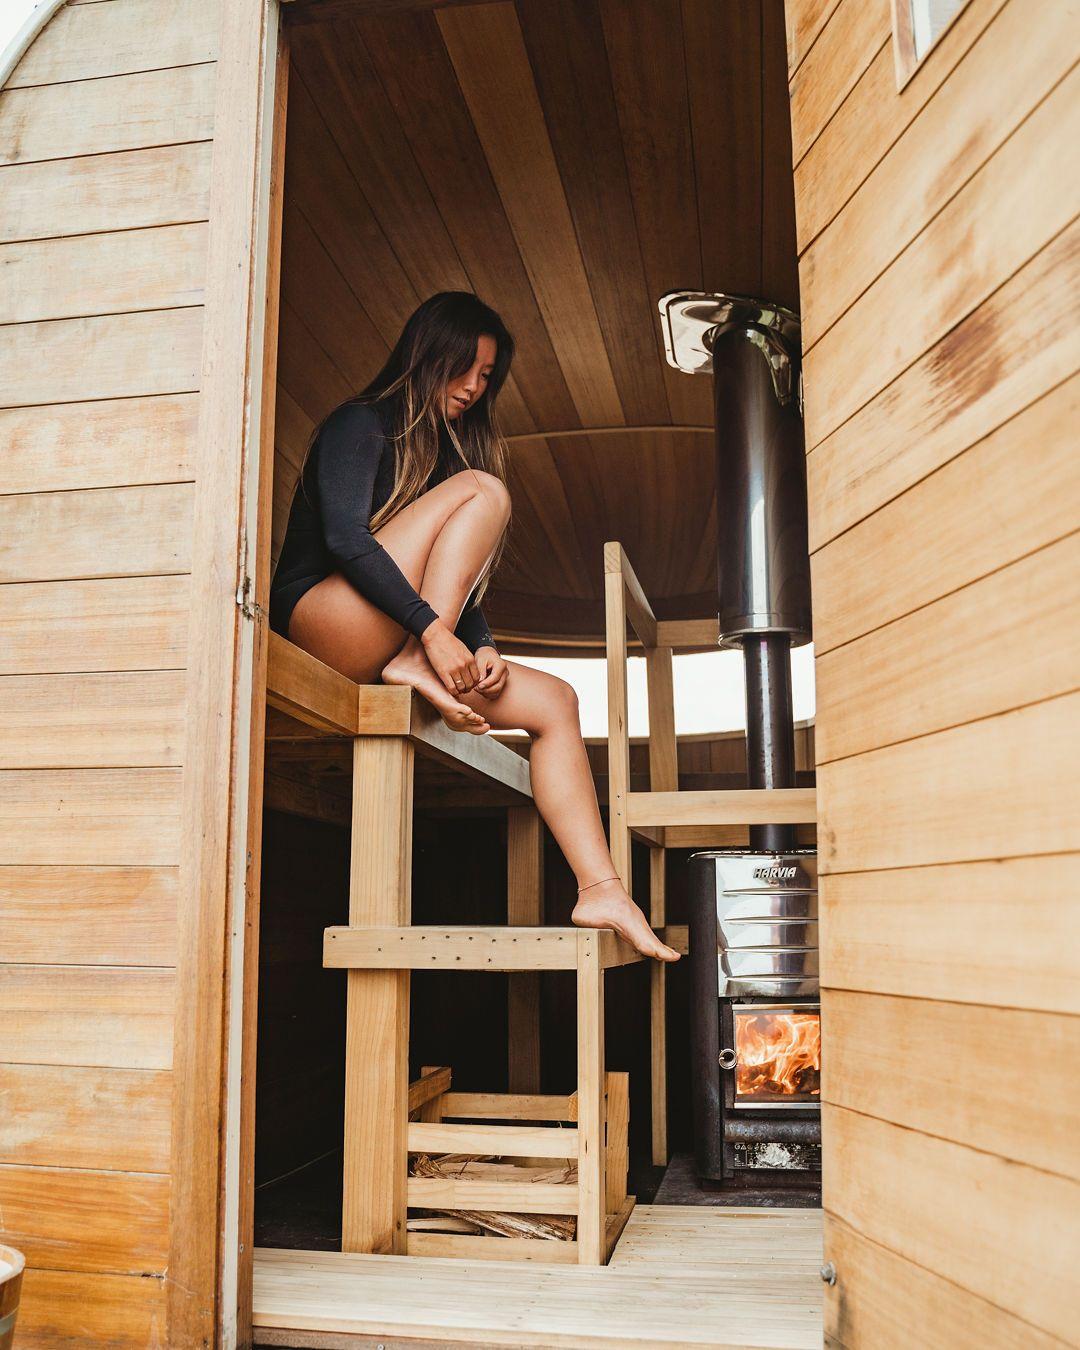 Kaarna Sauna Winstermeet